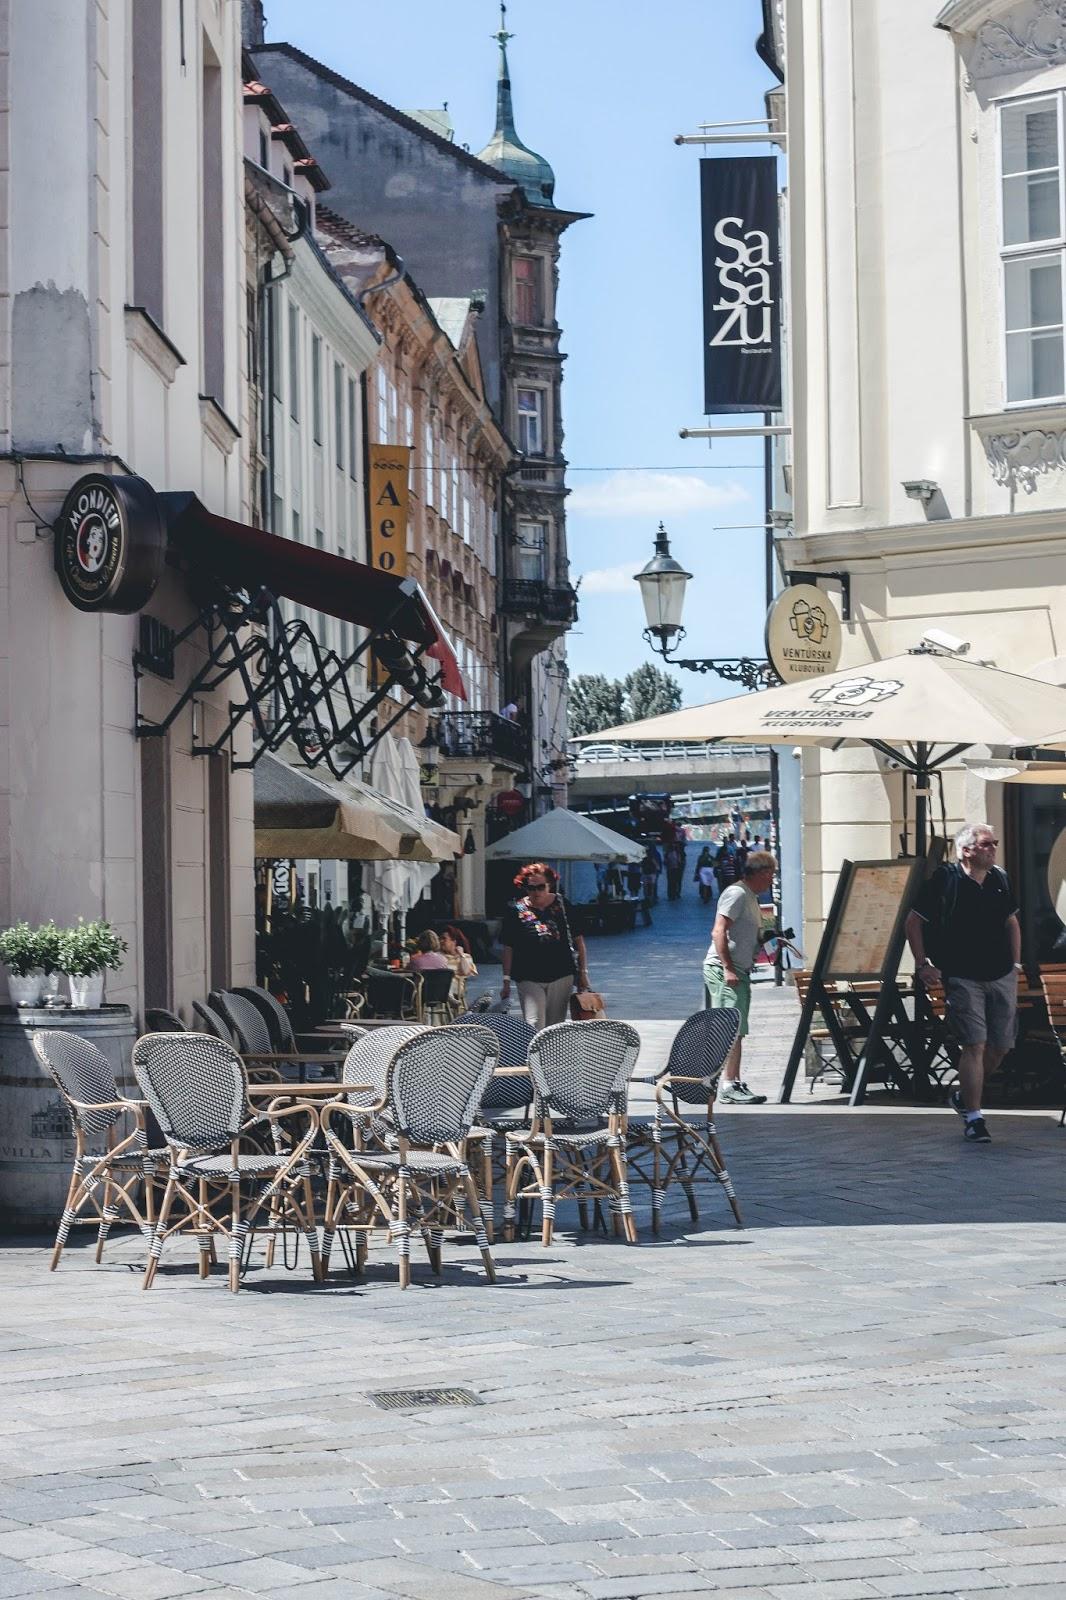 singapore blogger travel europe holiday slovakia bratislava summer street photographer photography look book style